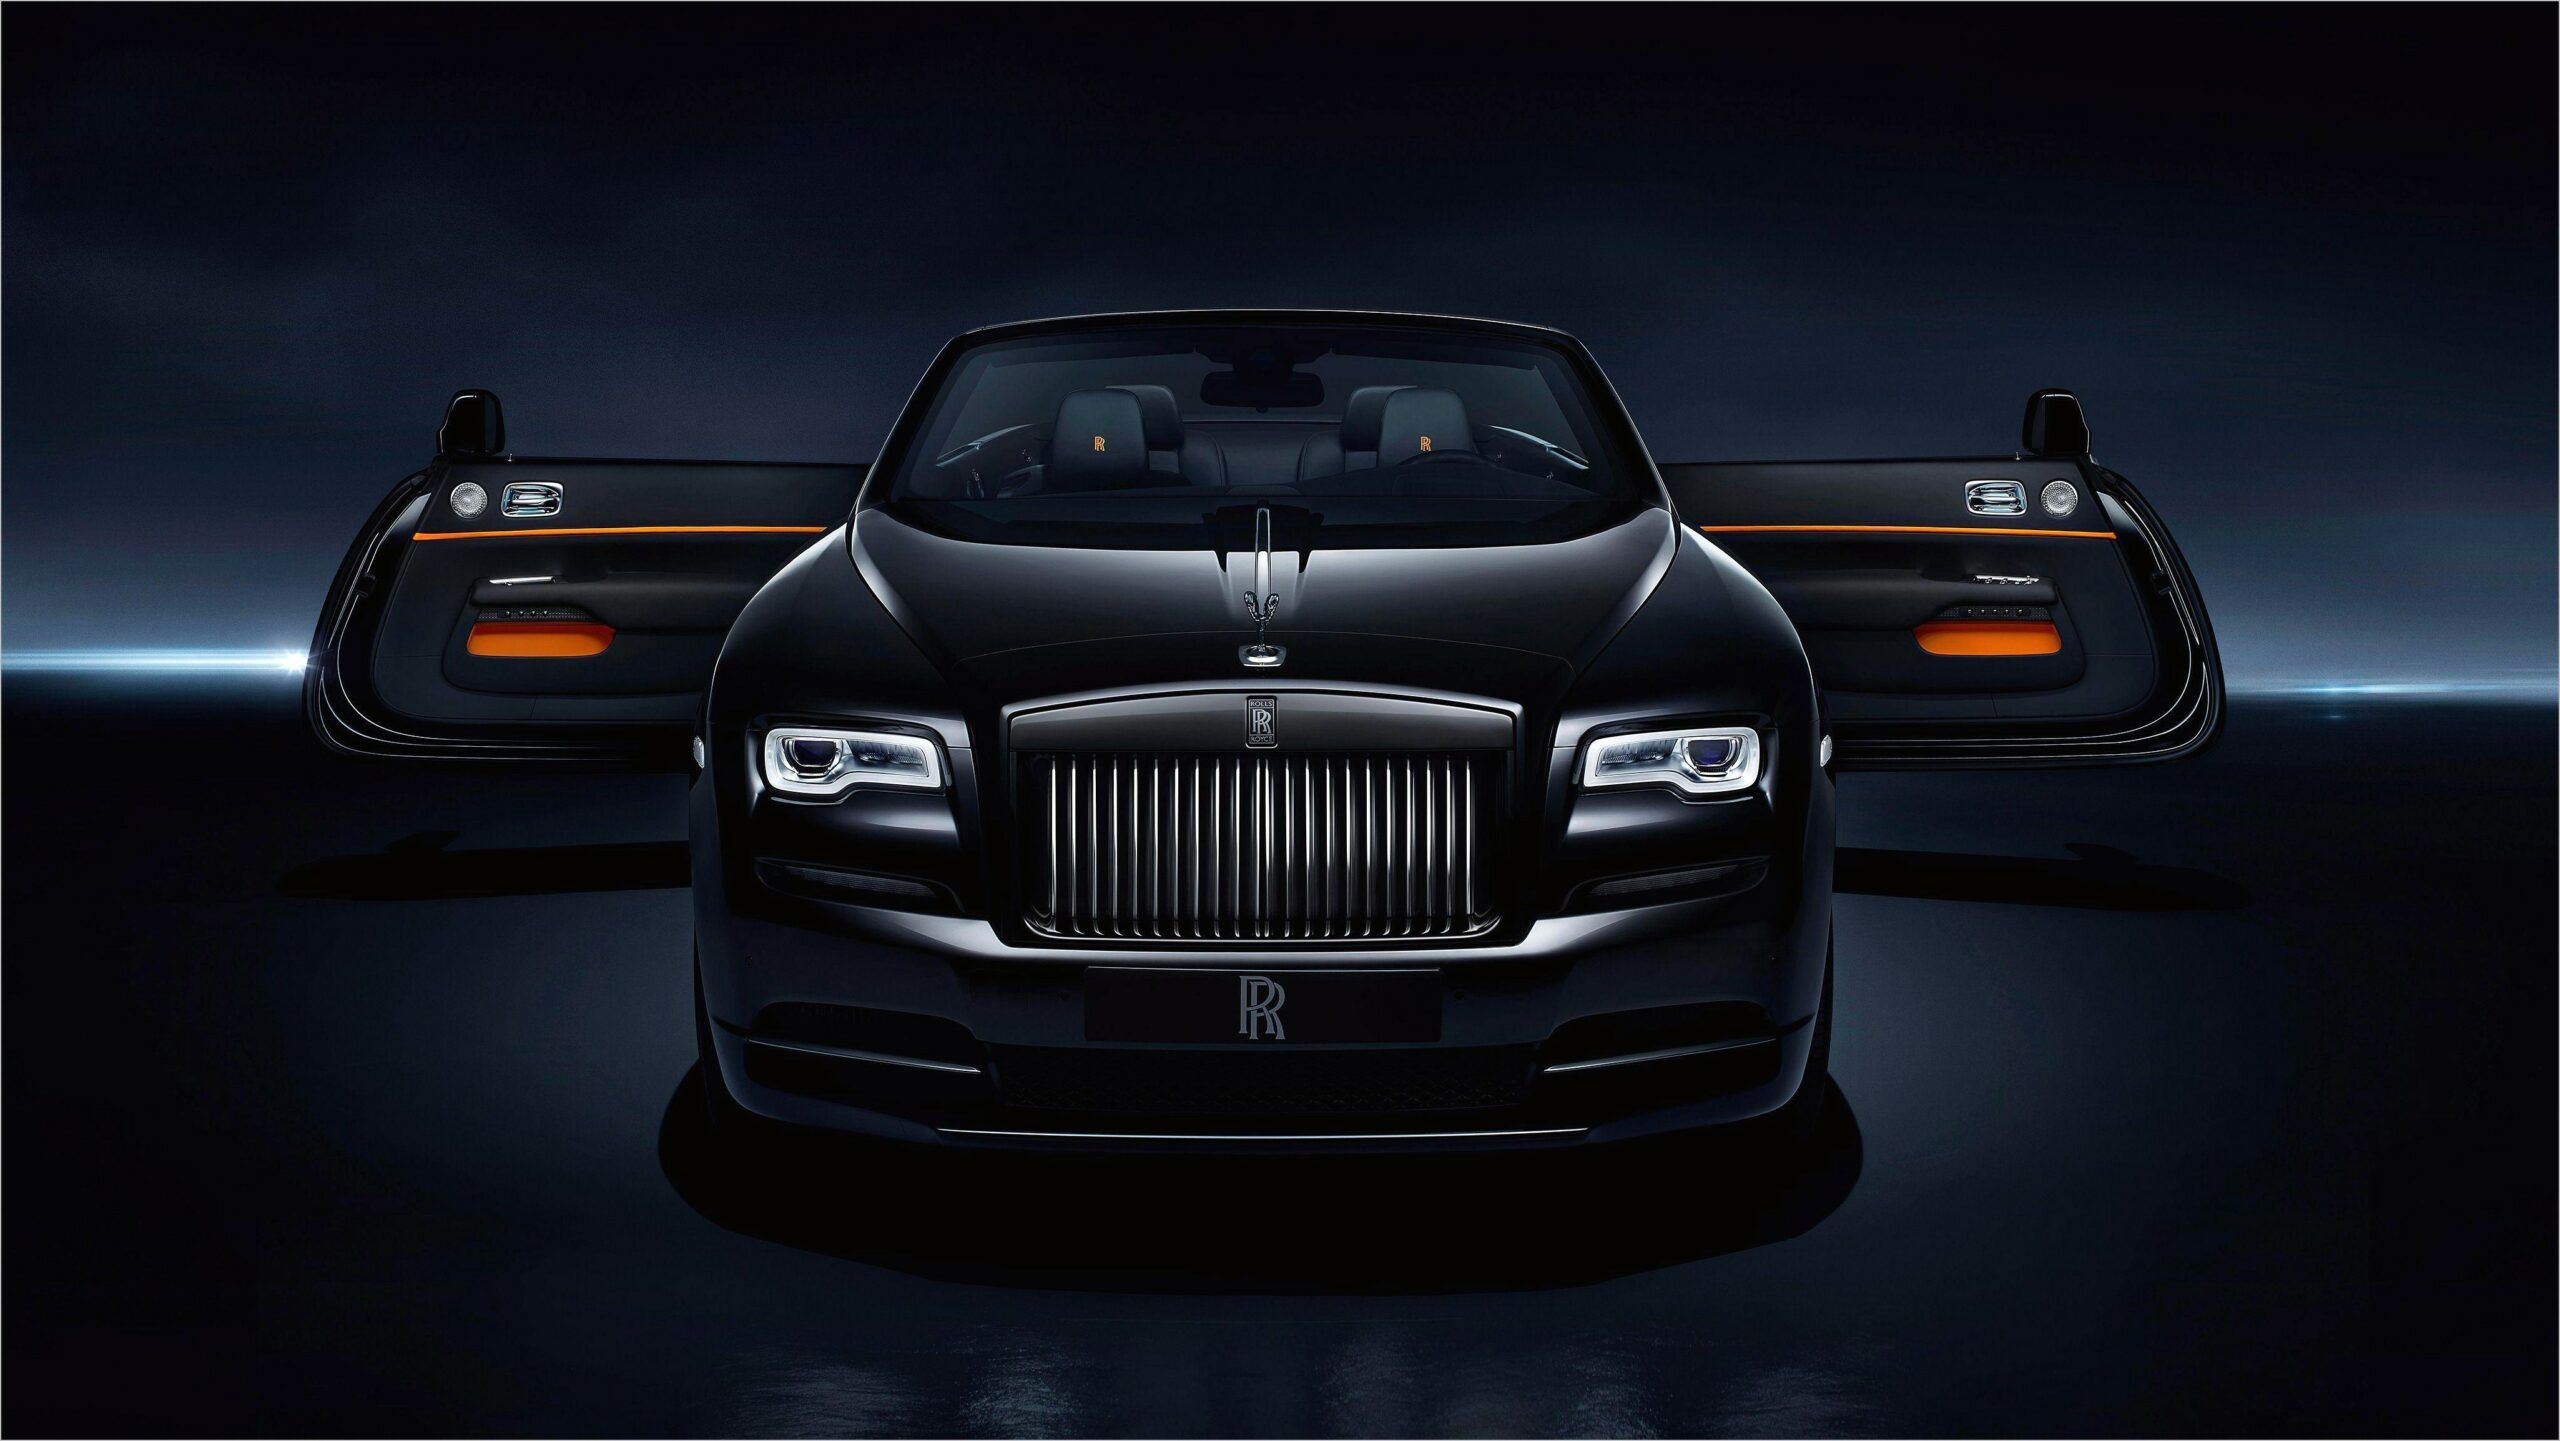 Rolls Royce Wraith Black Badge Rolls Royce Wraith Wallpapers Rolls Royce Wallpapers Hd Wallpa Rolls Royce Wraith Black Rolls Royce Wraith Black Car Wallpaper